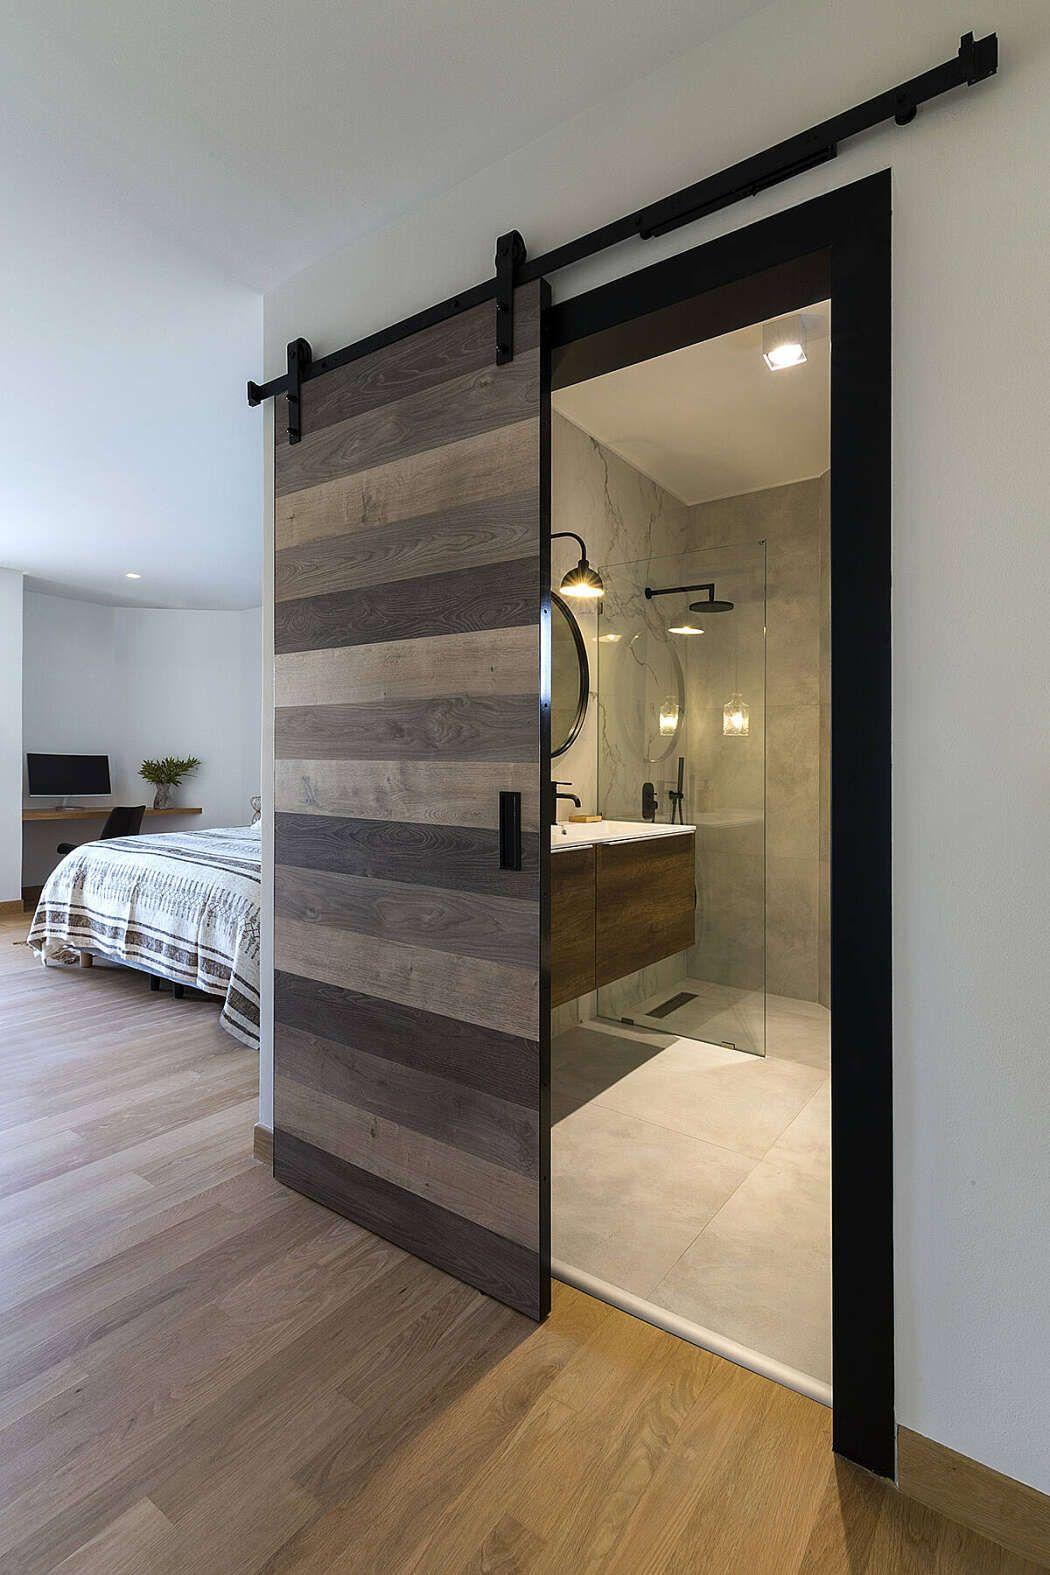 Apartment Renovation by Schema Architecture & Engi